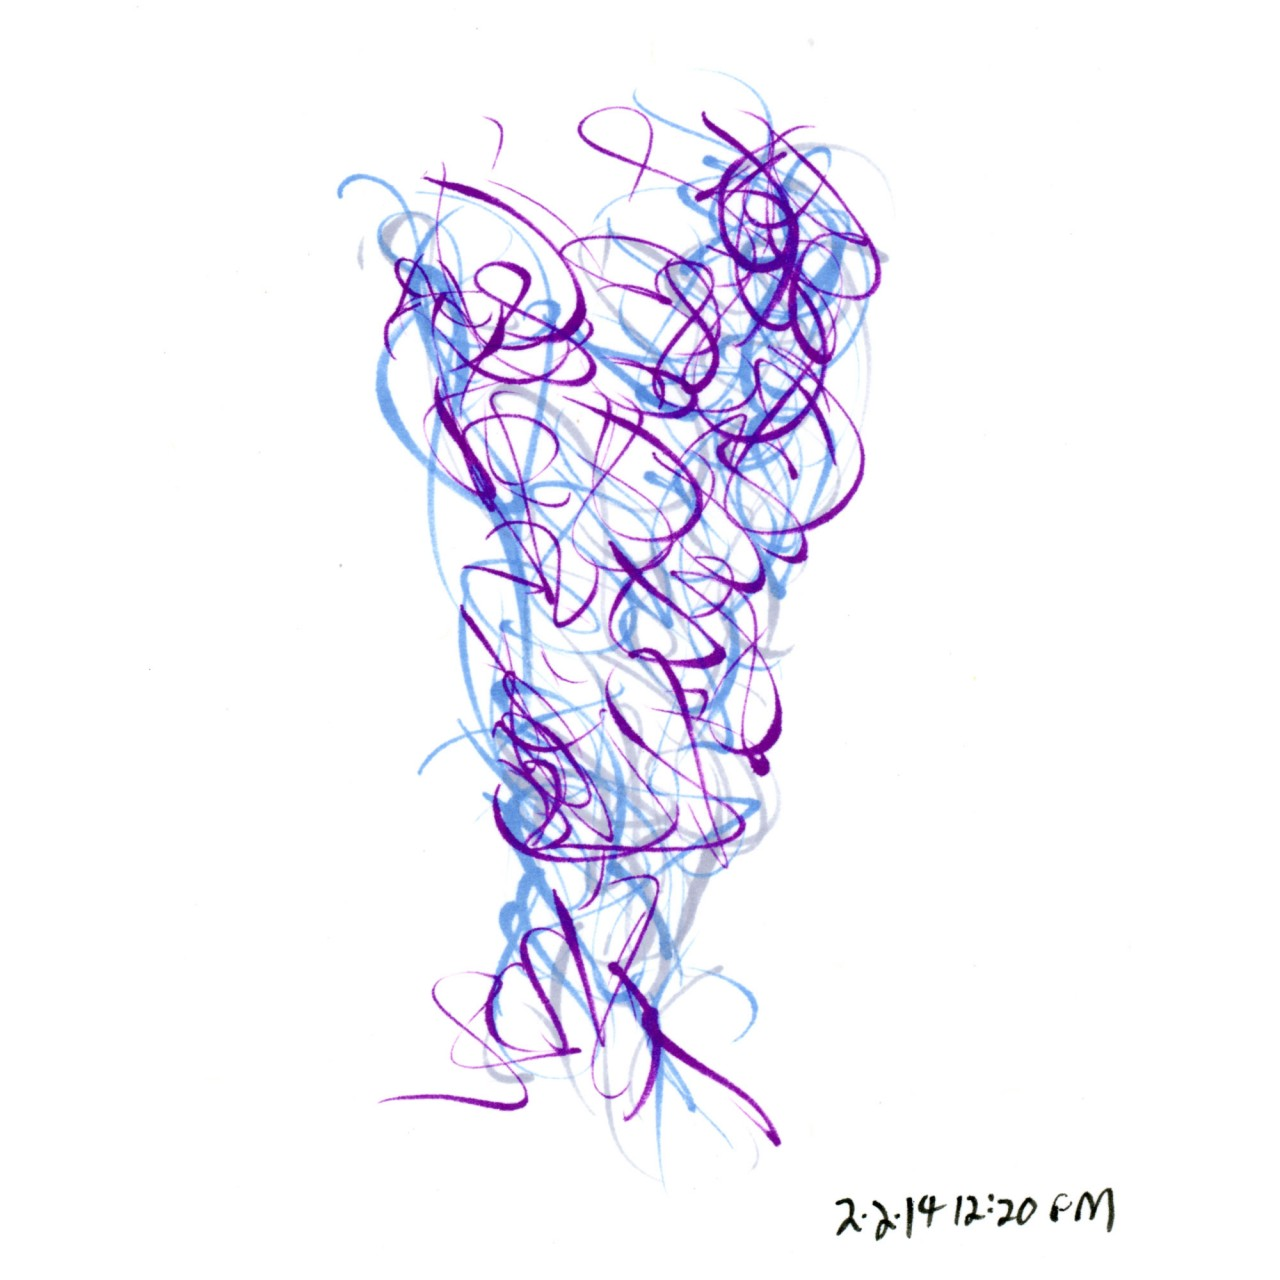 2014-02-02_12-20pm